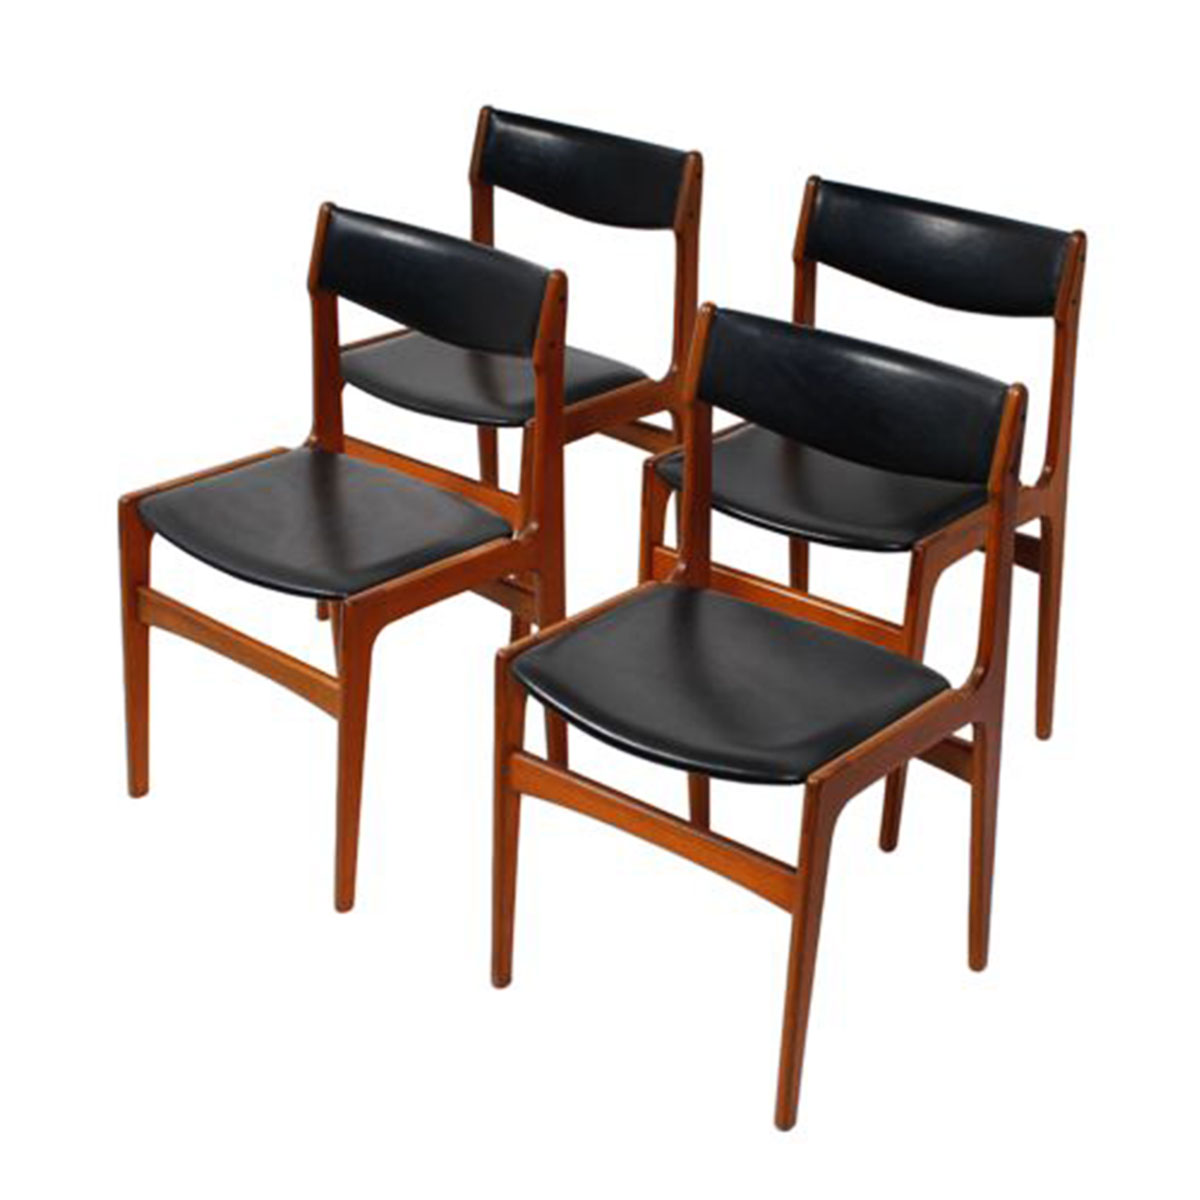 Teak Dining Chair Teak Dining Chair Chd 037 Teak Dining  : 3380 4DanishModernTeakDiningChairs from amlibgroup.com size 1200 x 1200 jpeg 101kB